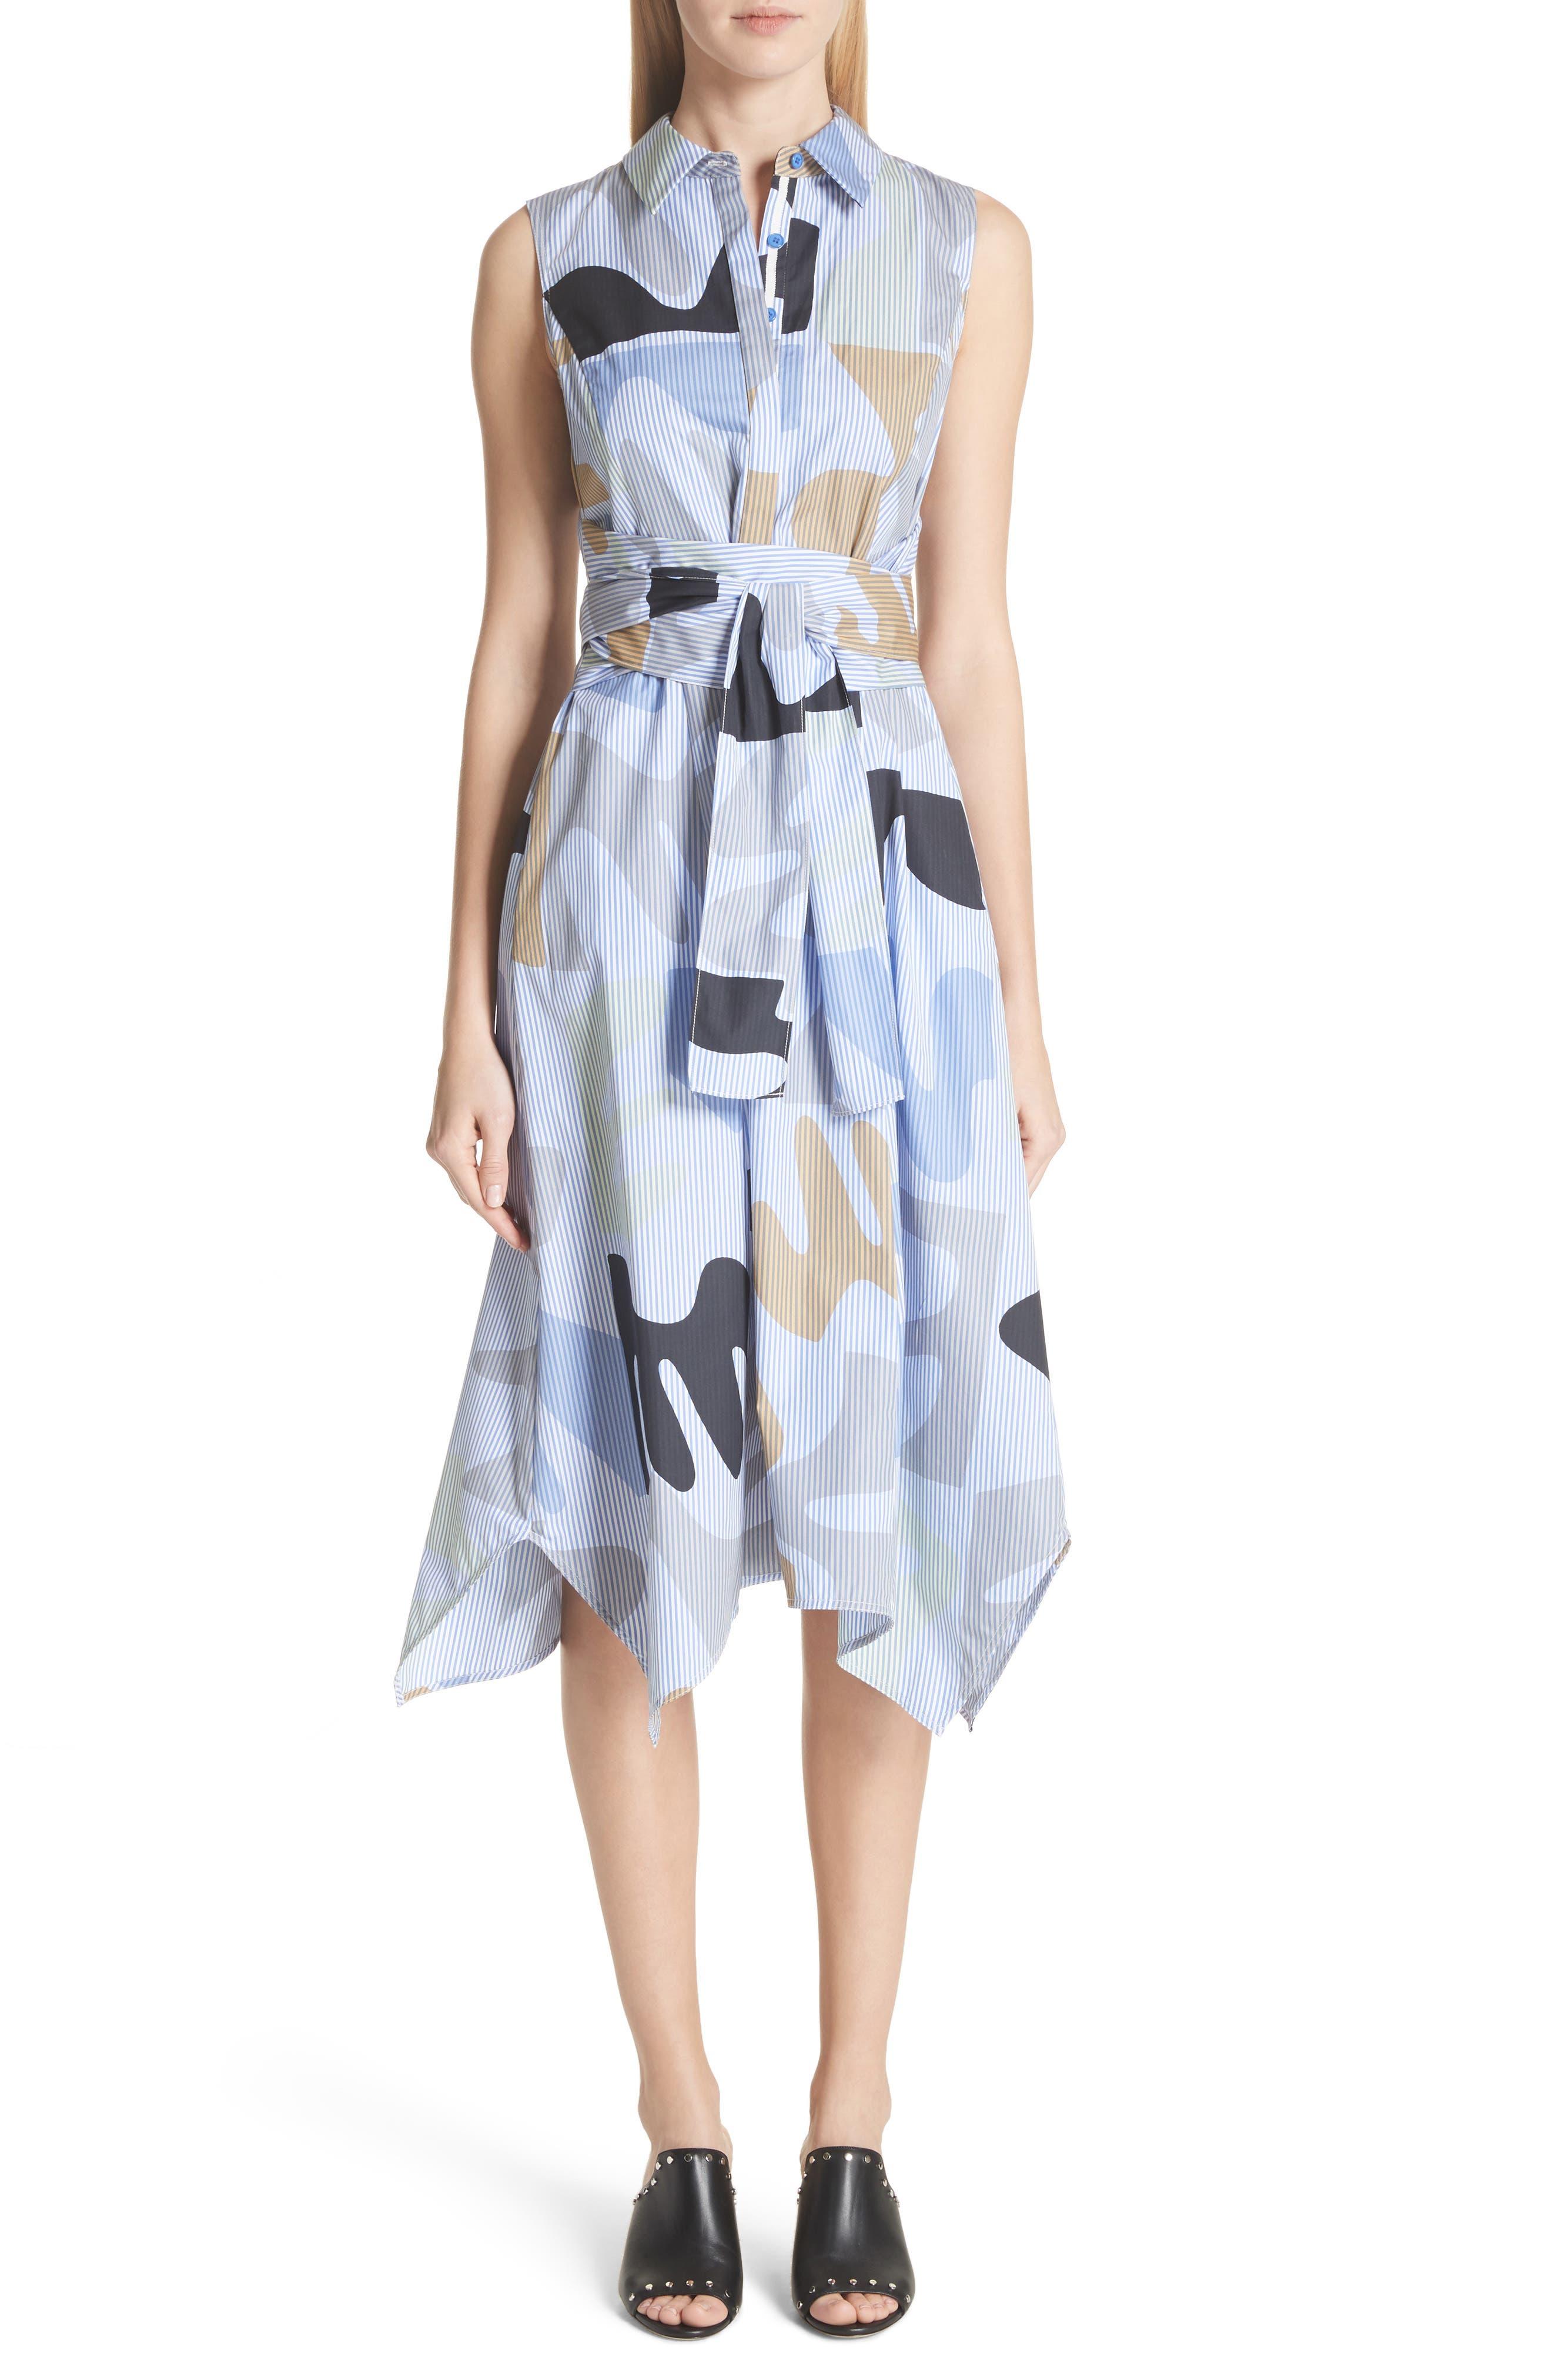 Cordelia Urban Ethos Stripe Dress,                         Main,                         color, Periwinkle Multi